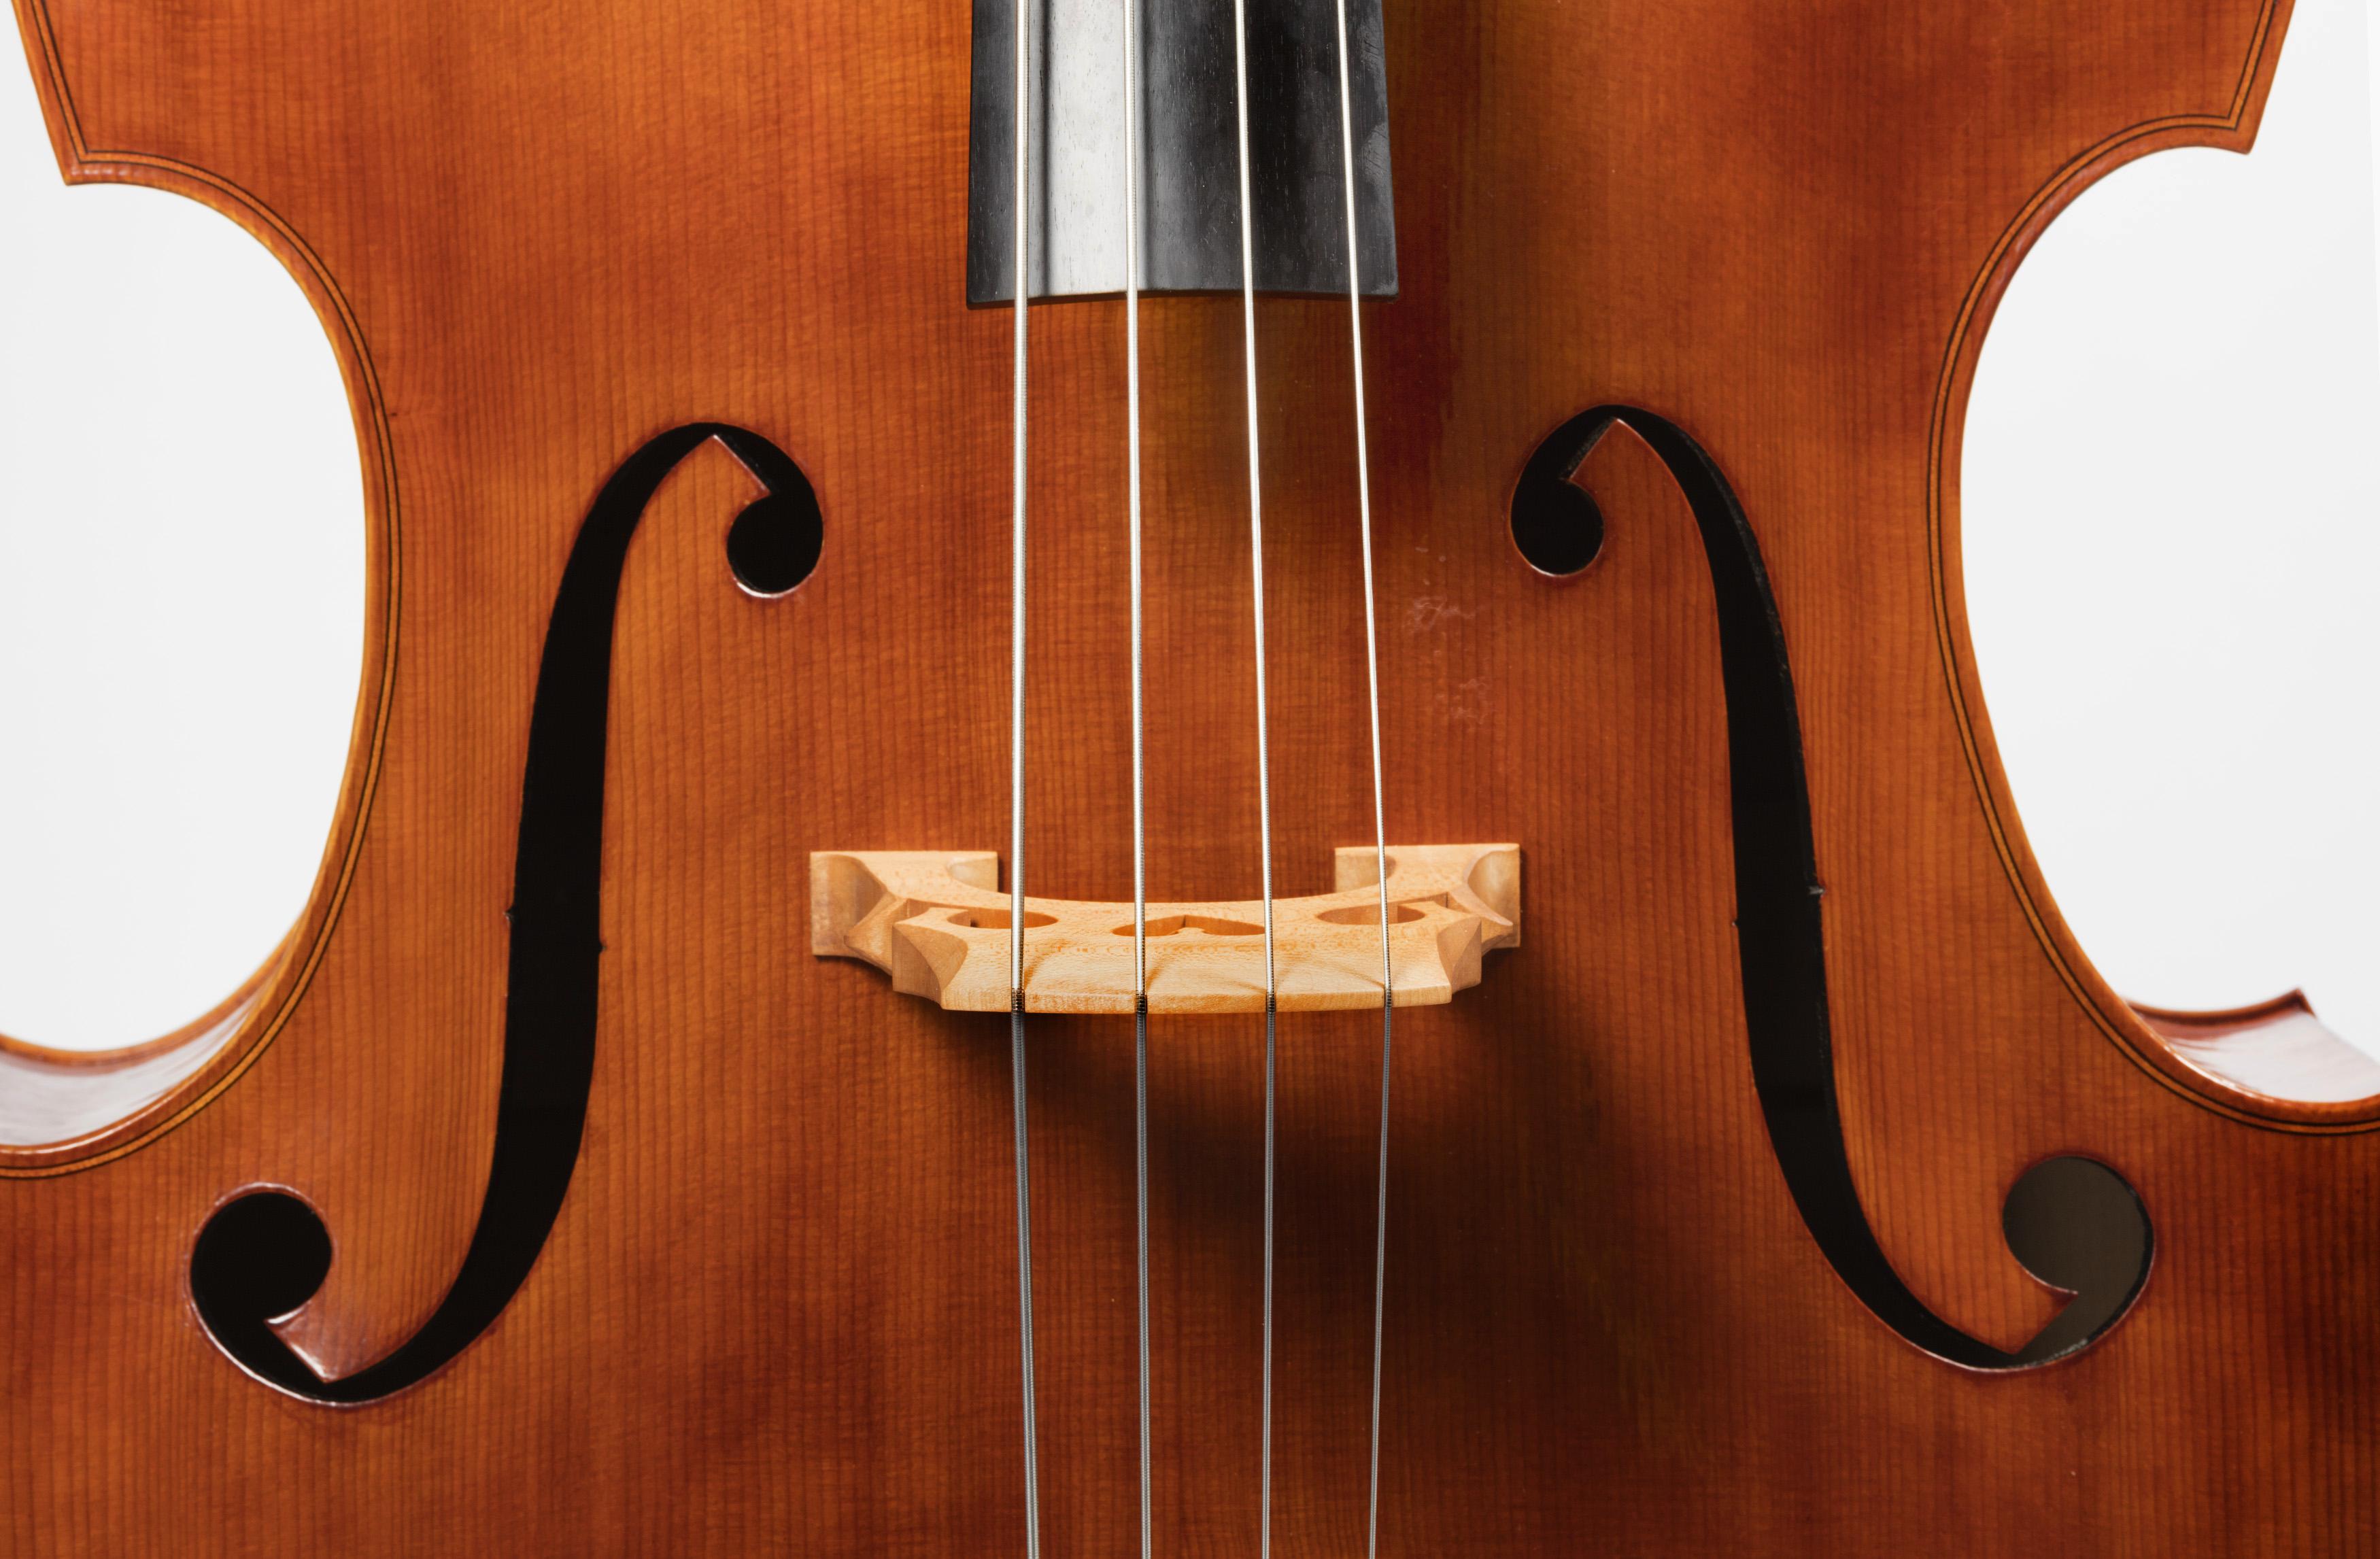 MATHER_0280_W Mackay Double Bass detail.